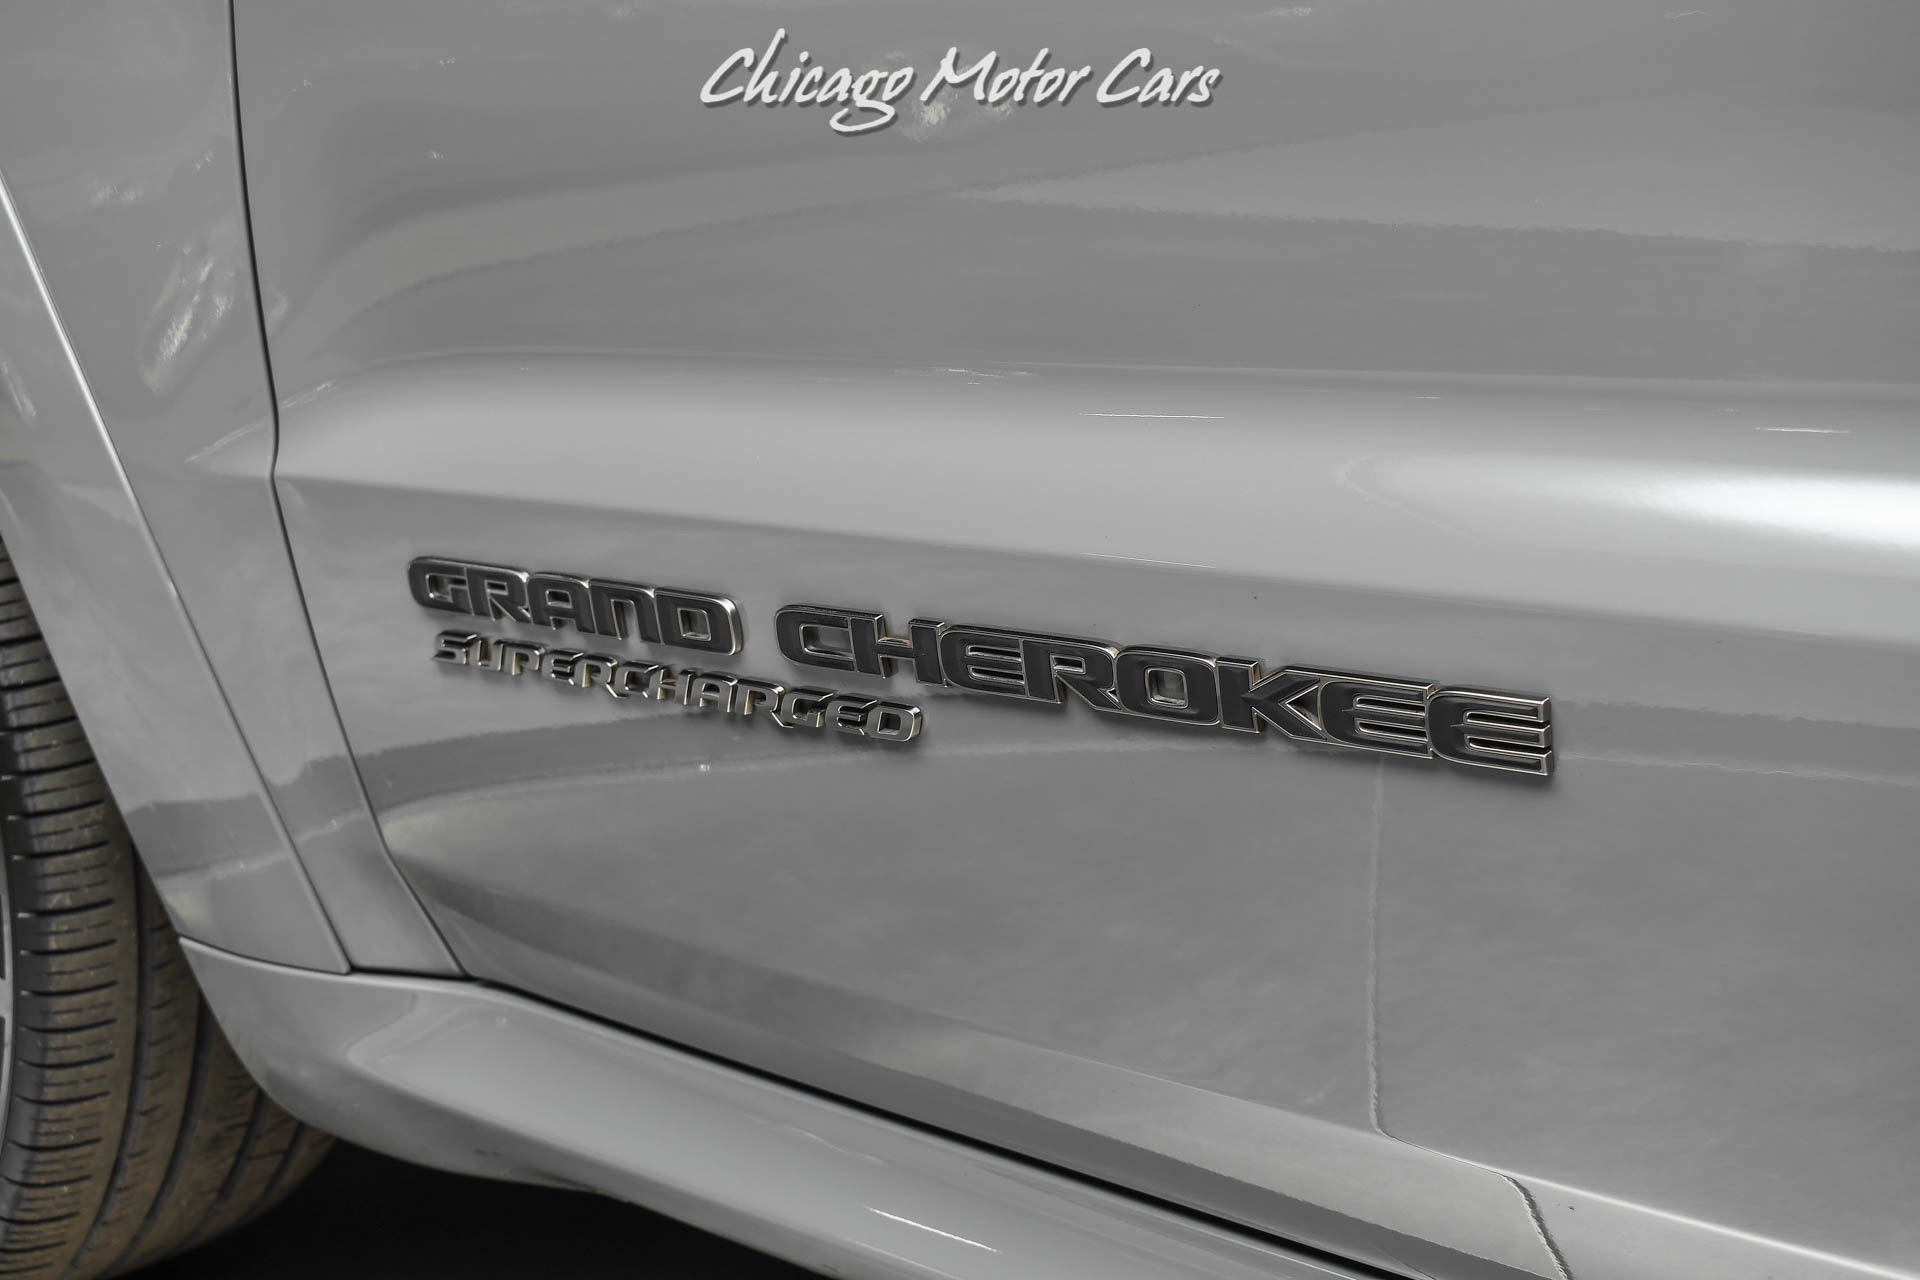 Used-2019-Jeep-Grand-Cherokee-Trackhawk-707-Horsepower-Sting-Gray-Panoramic-Roof